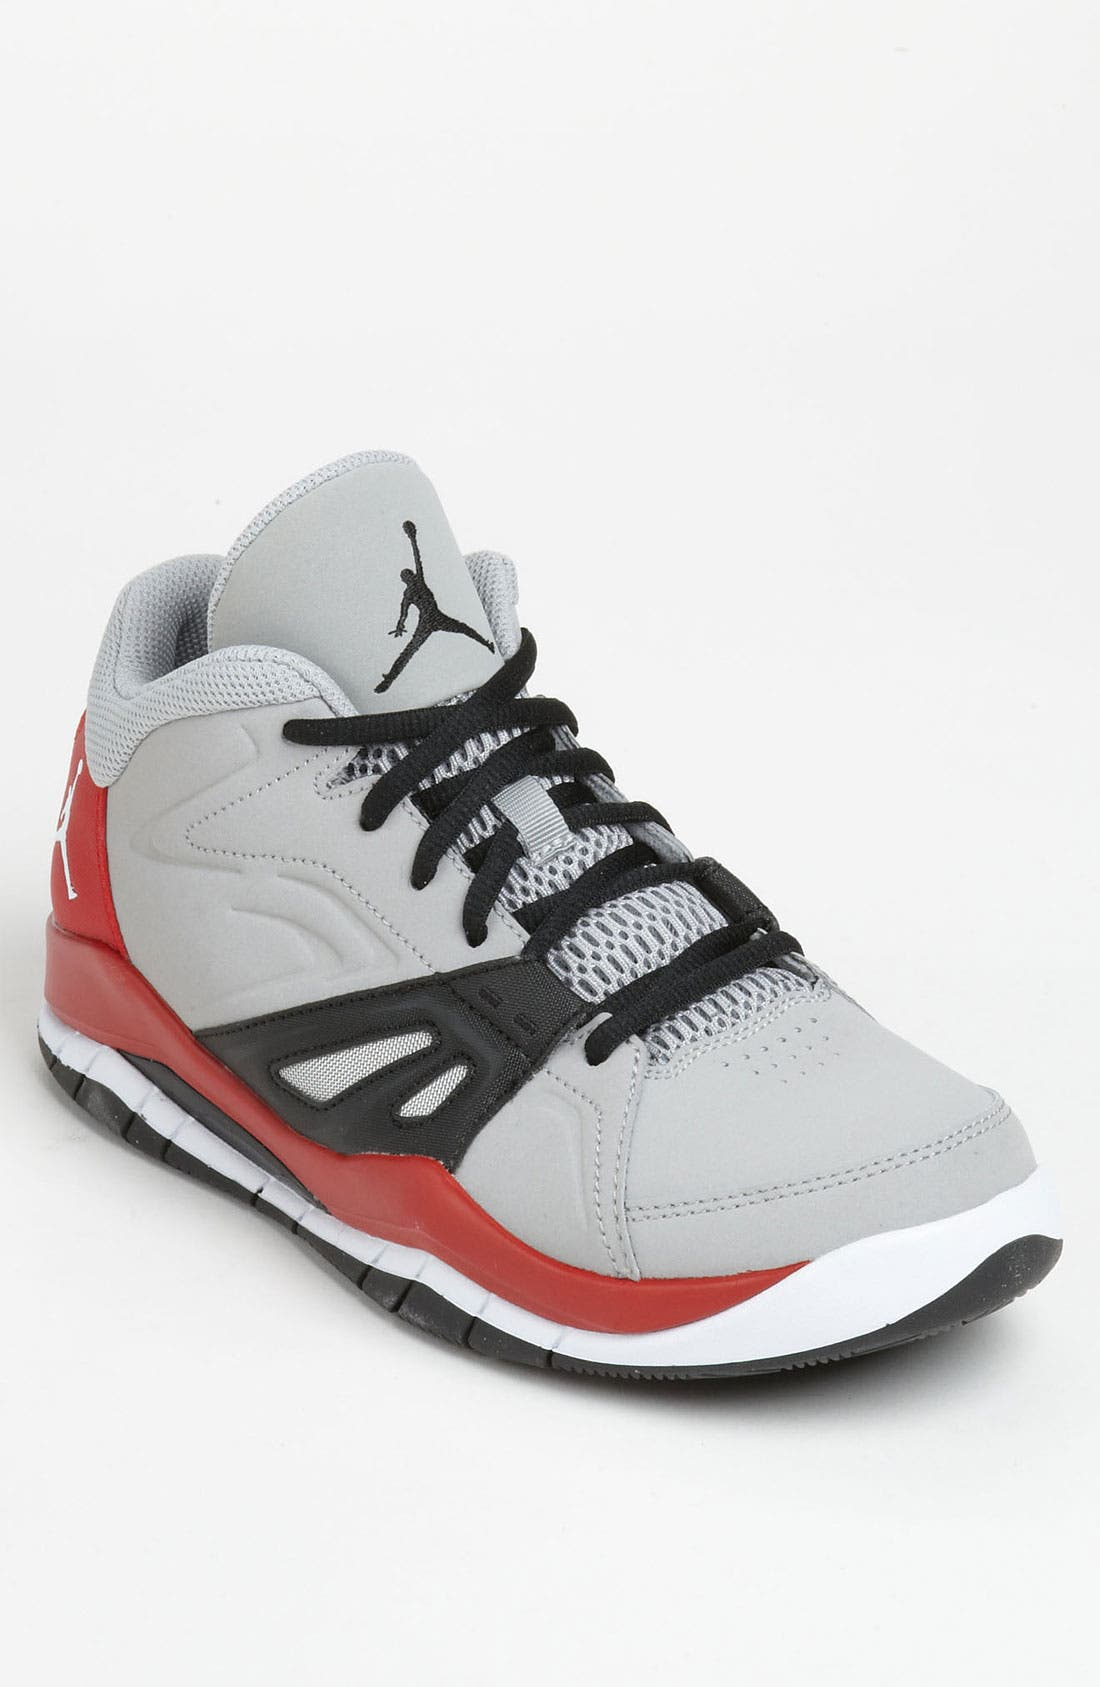 Alternate Image 1 Selected - Nike 'Jordan Ace 23' Basketball Shoe (Big Kid)